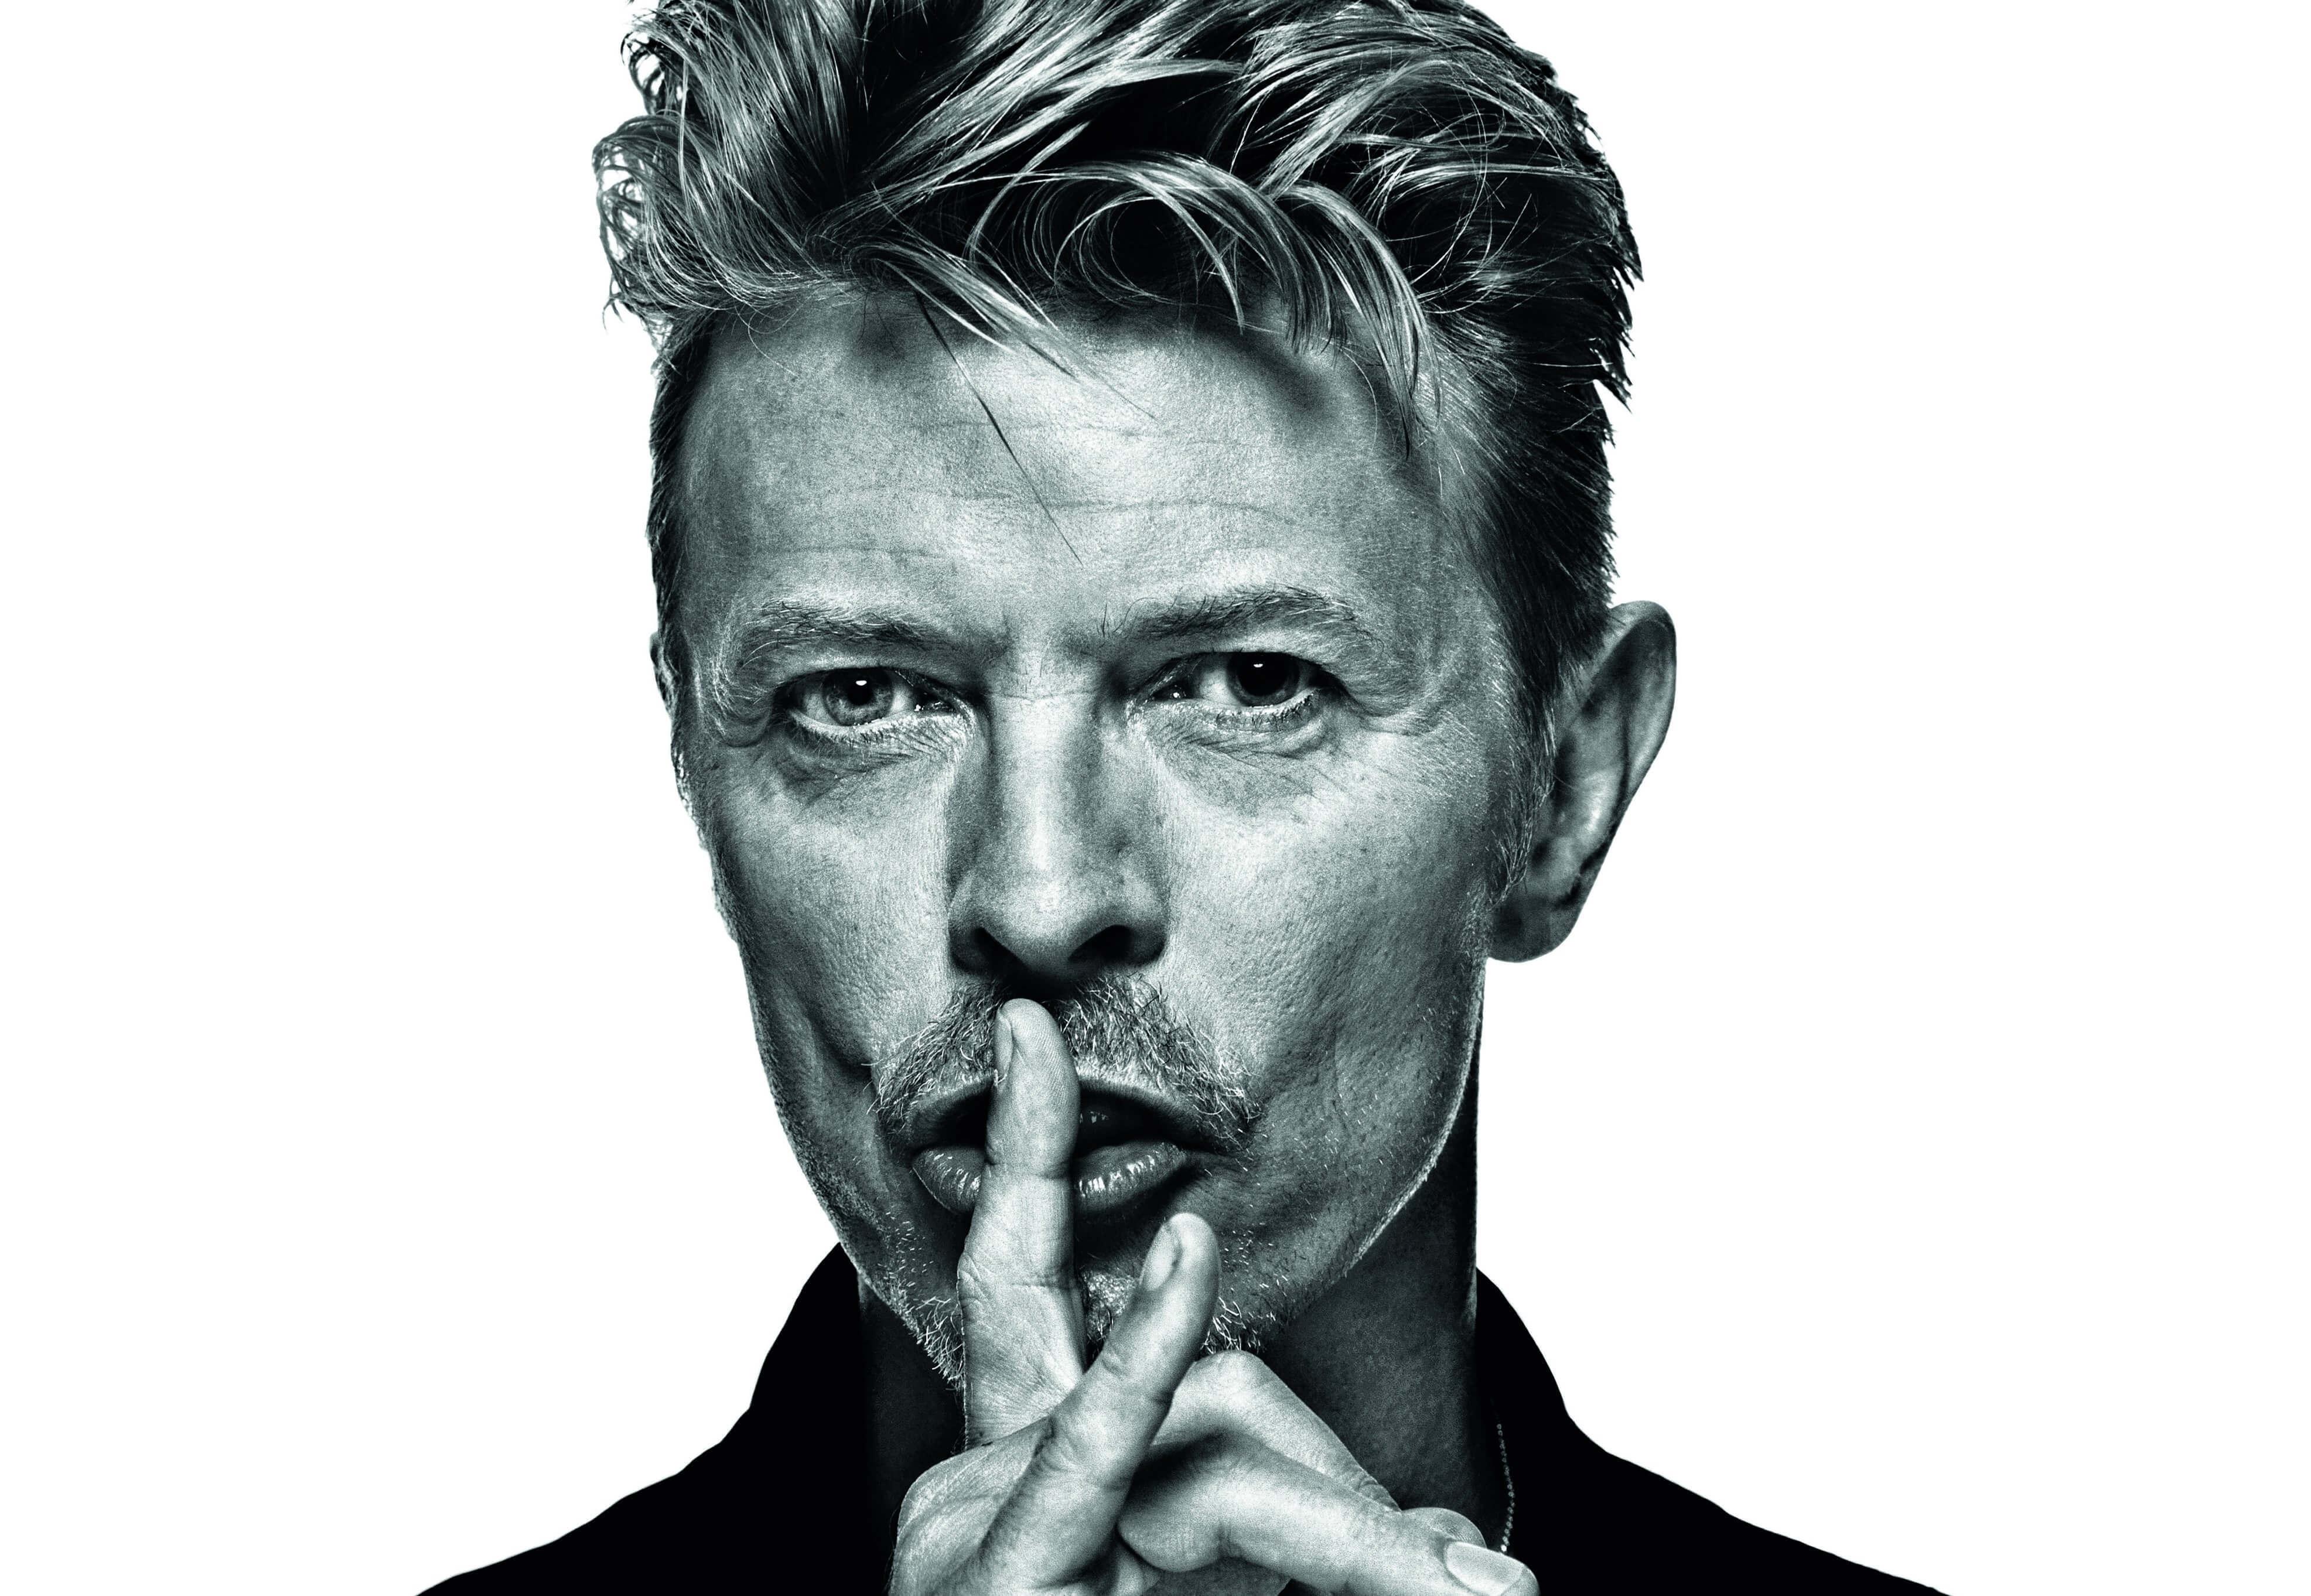 David Bowie 4K